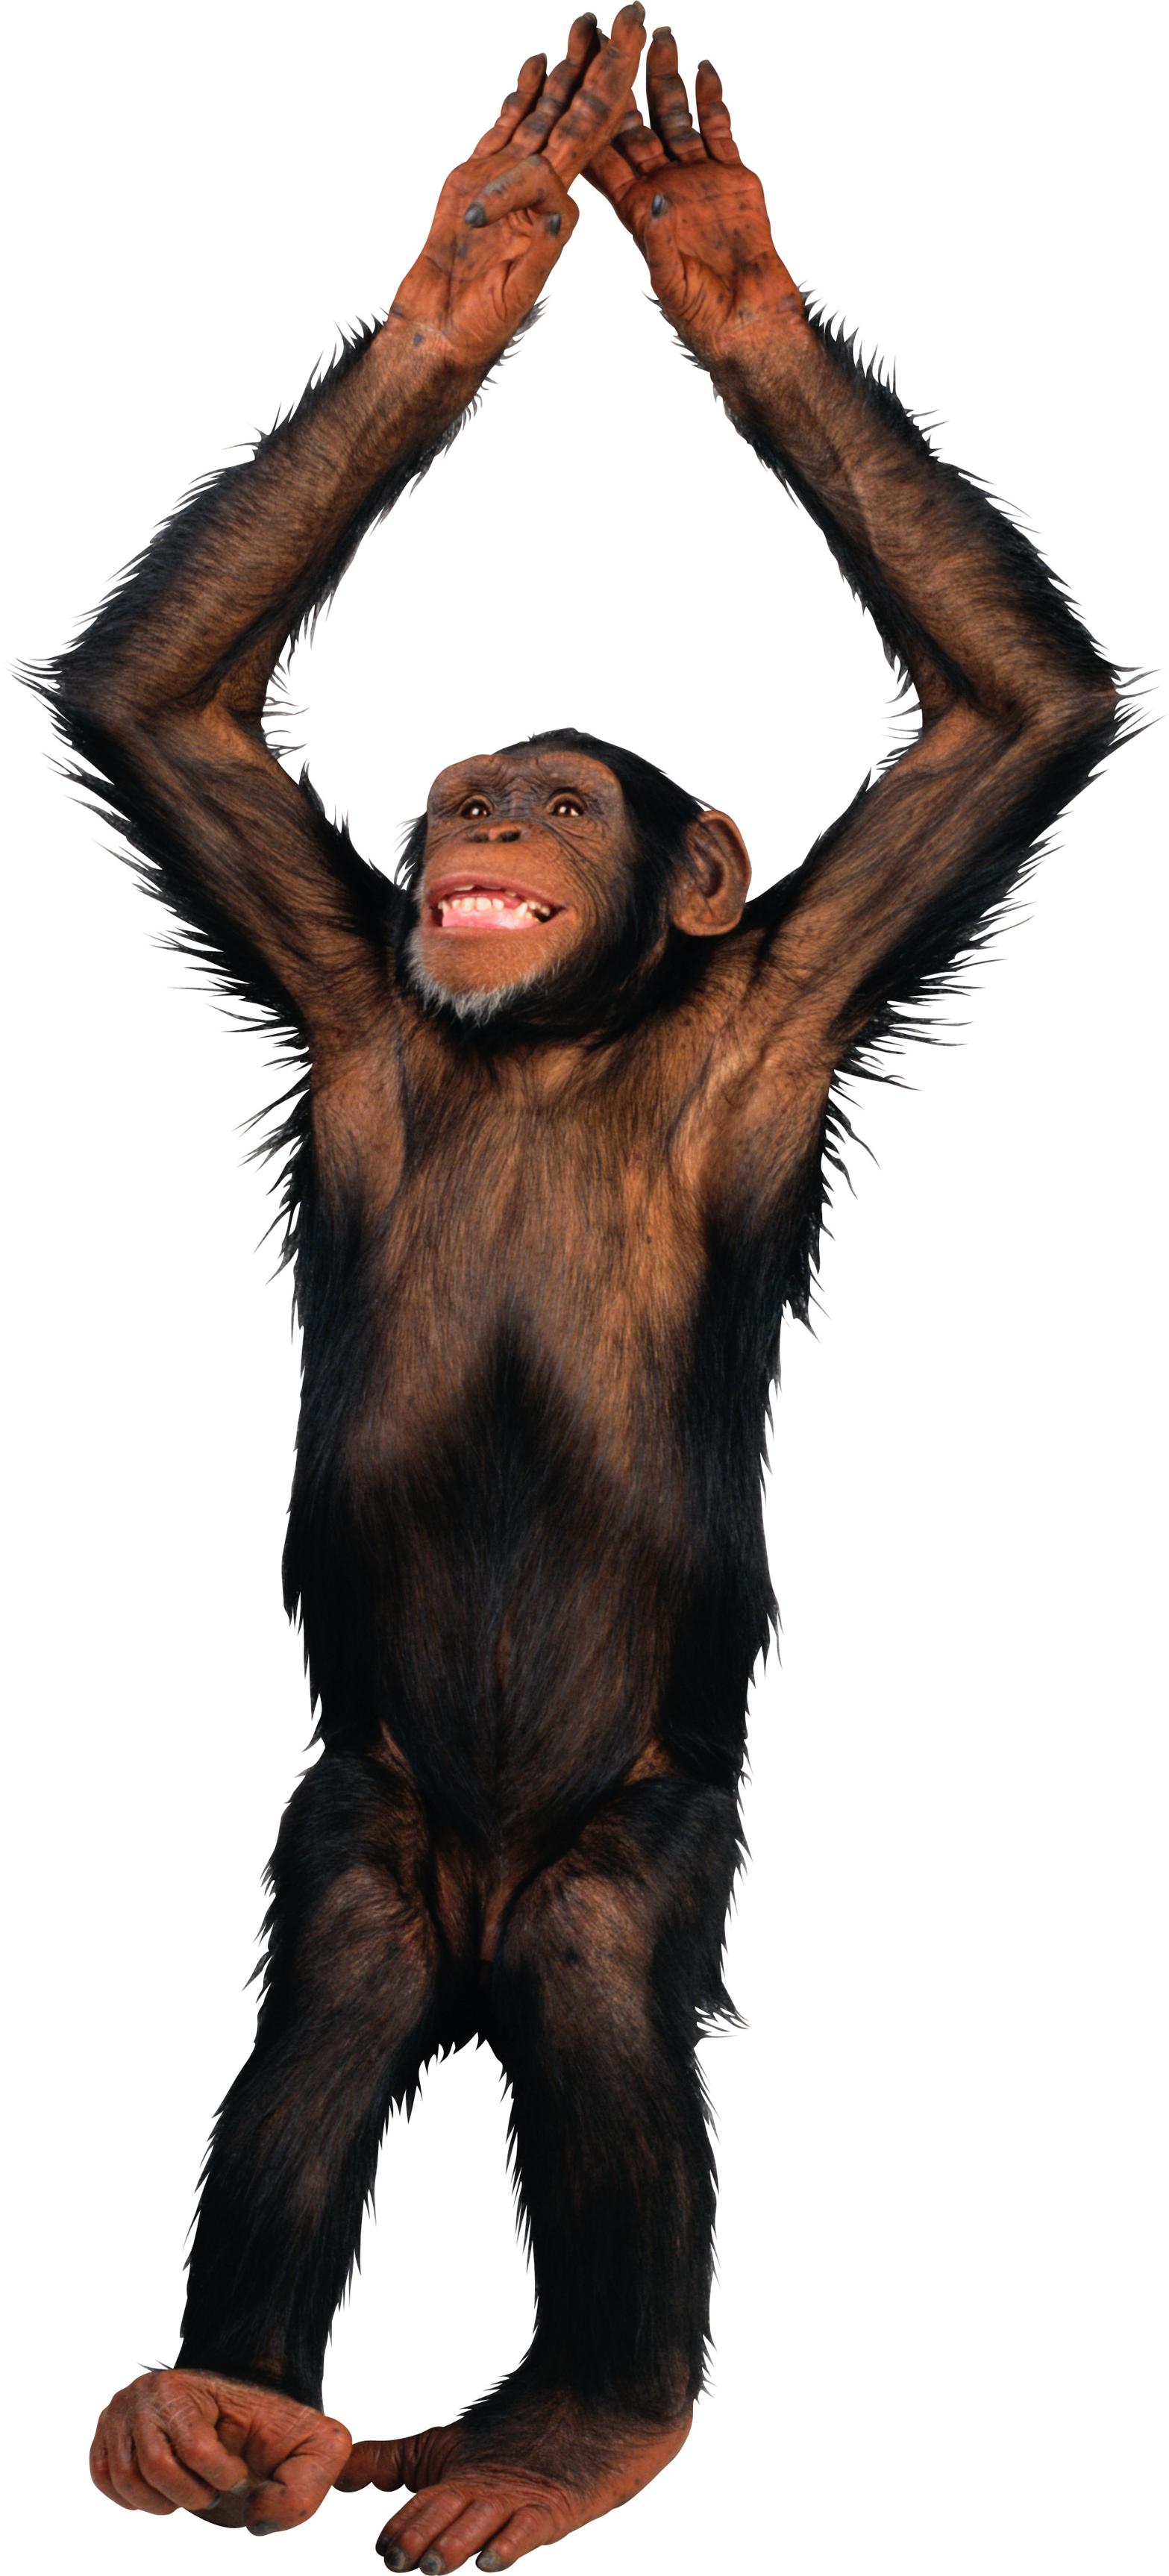 svg Ape clipart monke. Monkey png